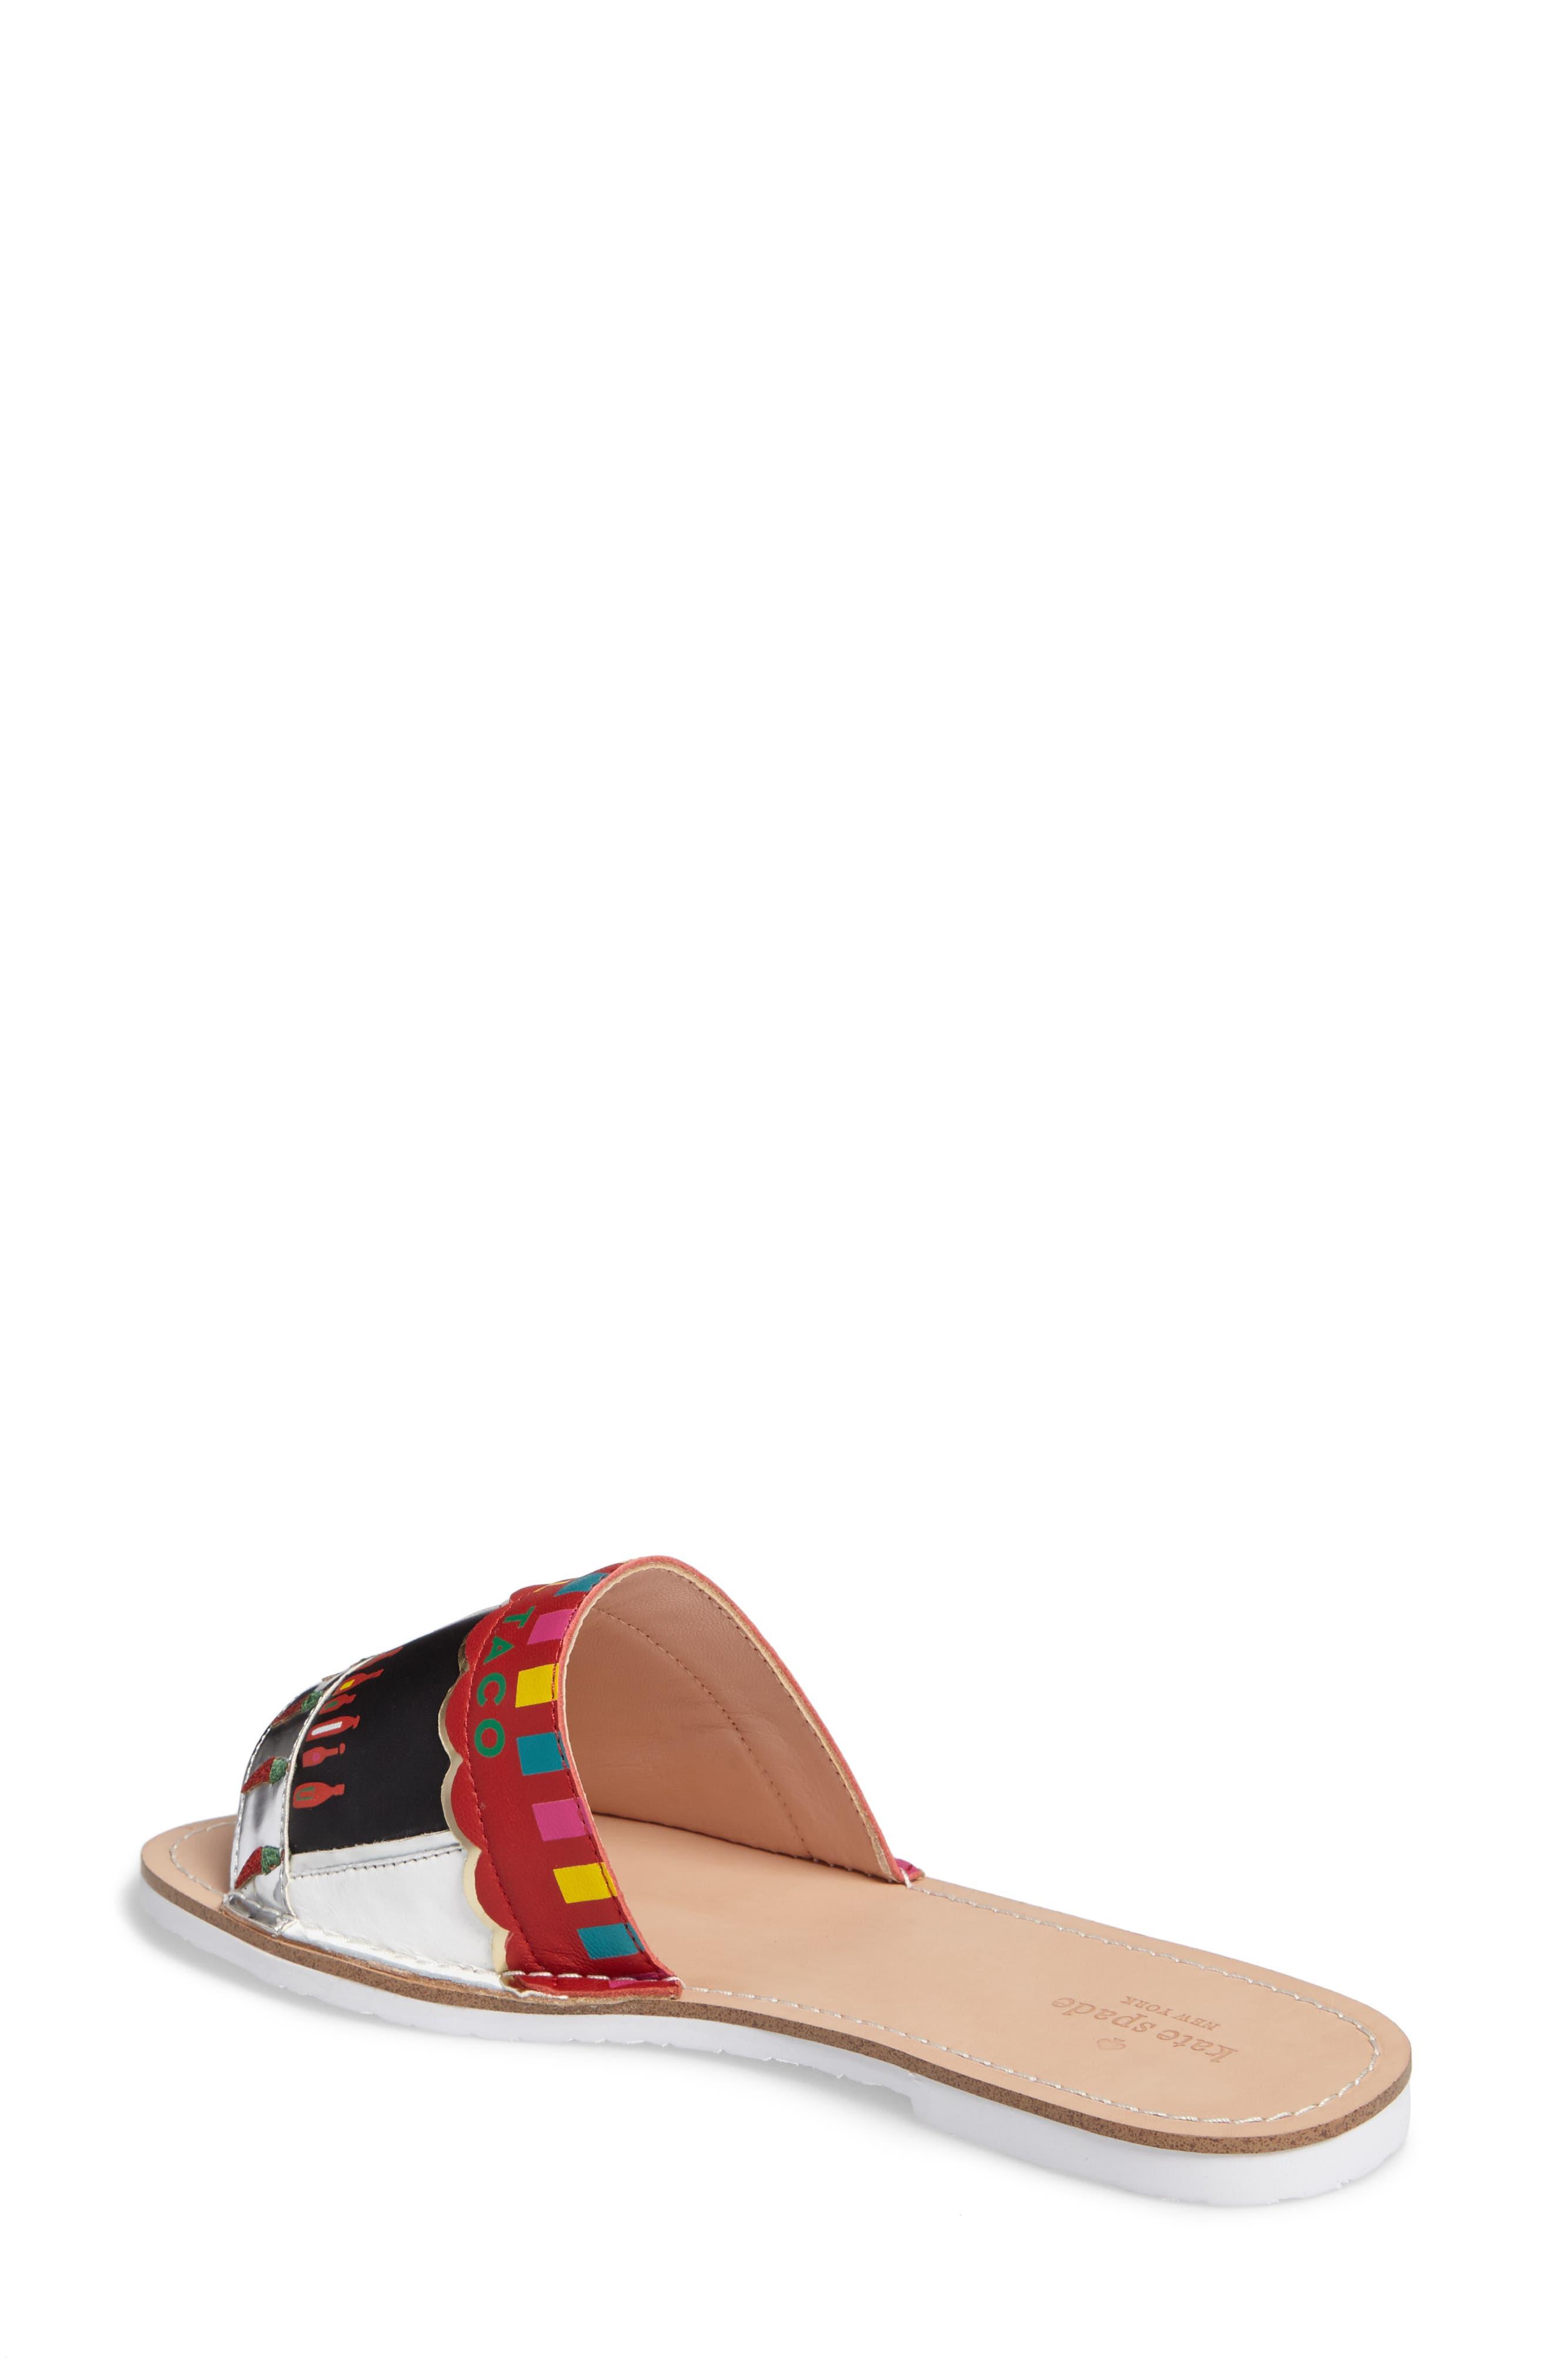 illi slide sandal,                             Alternate thumbnail 2, color,                             001